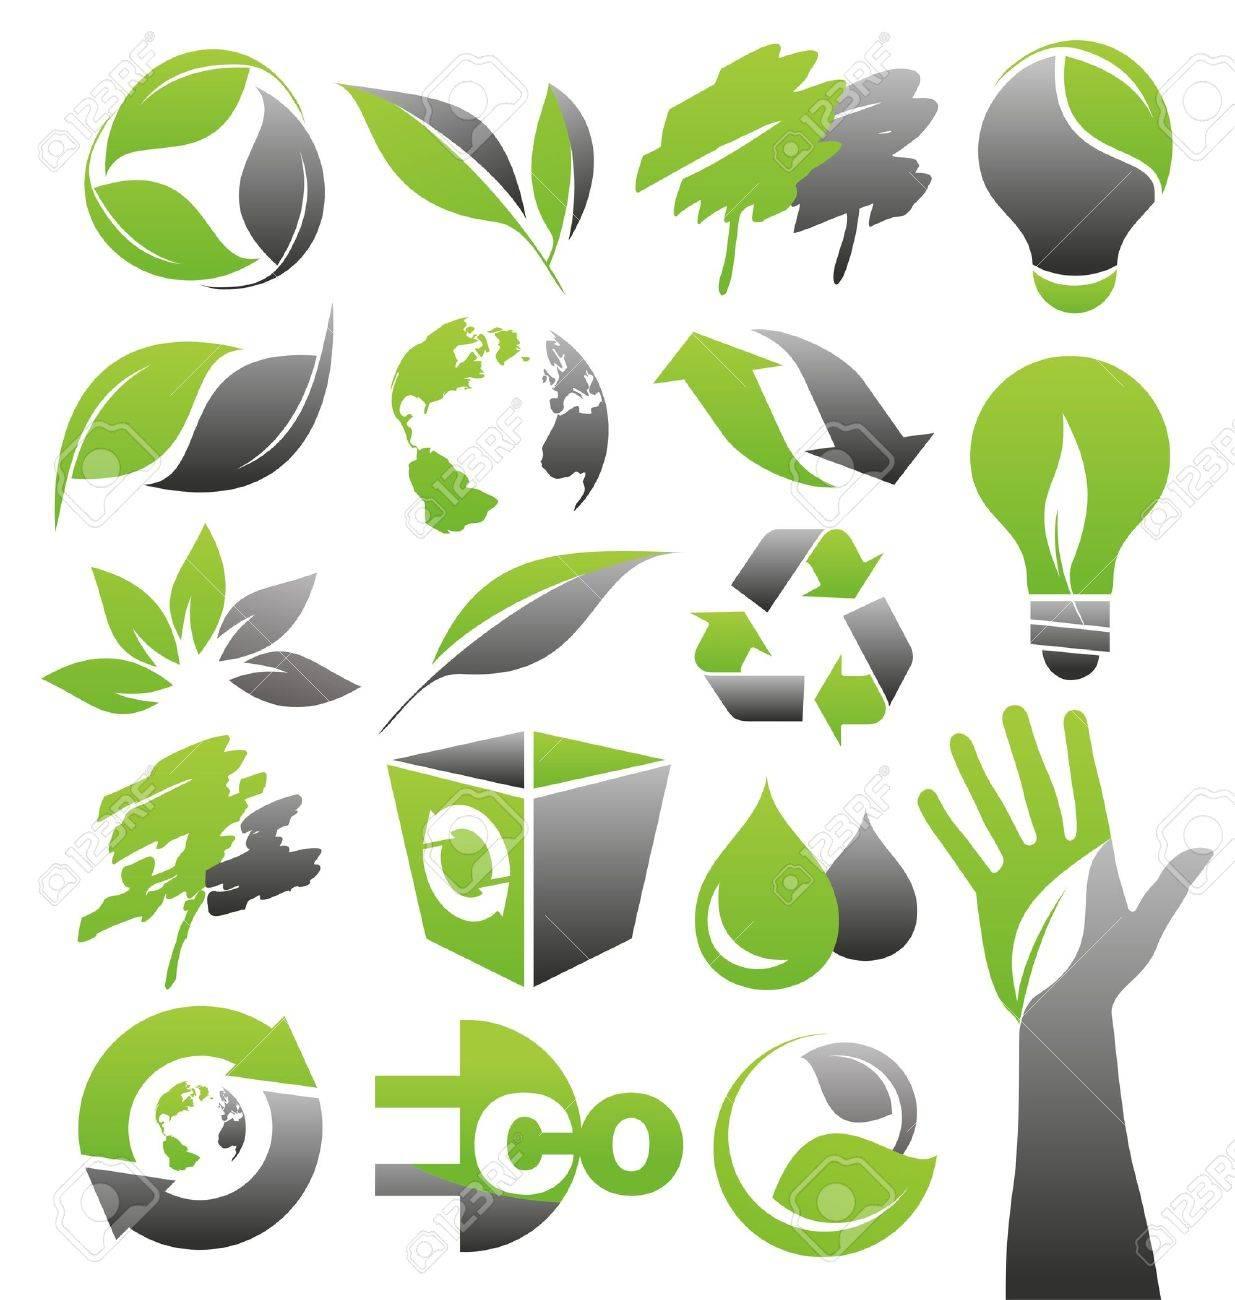 19 421 tree logo cliparts stock vector and royalty tree logo tree logo ecology green icons vector set